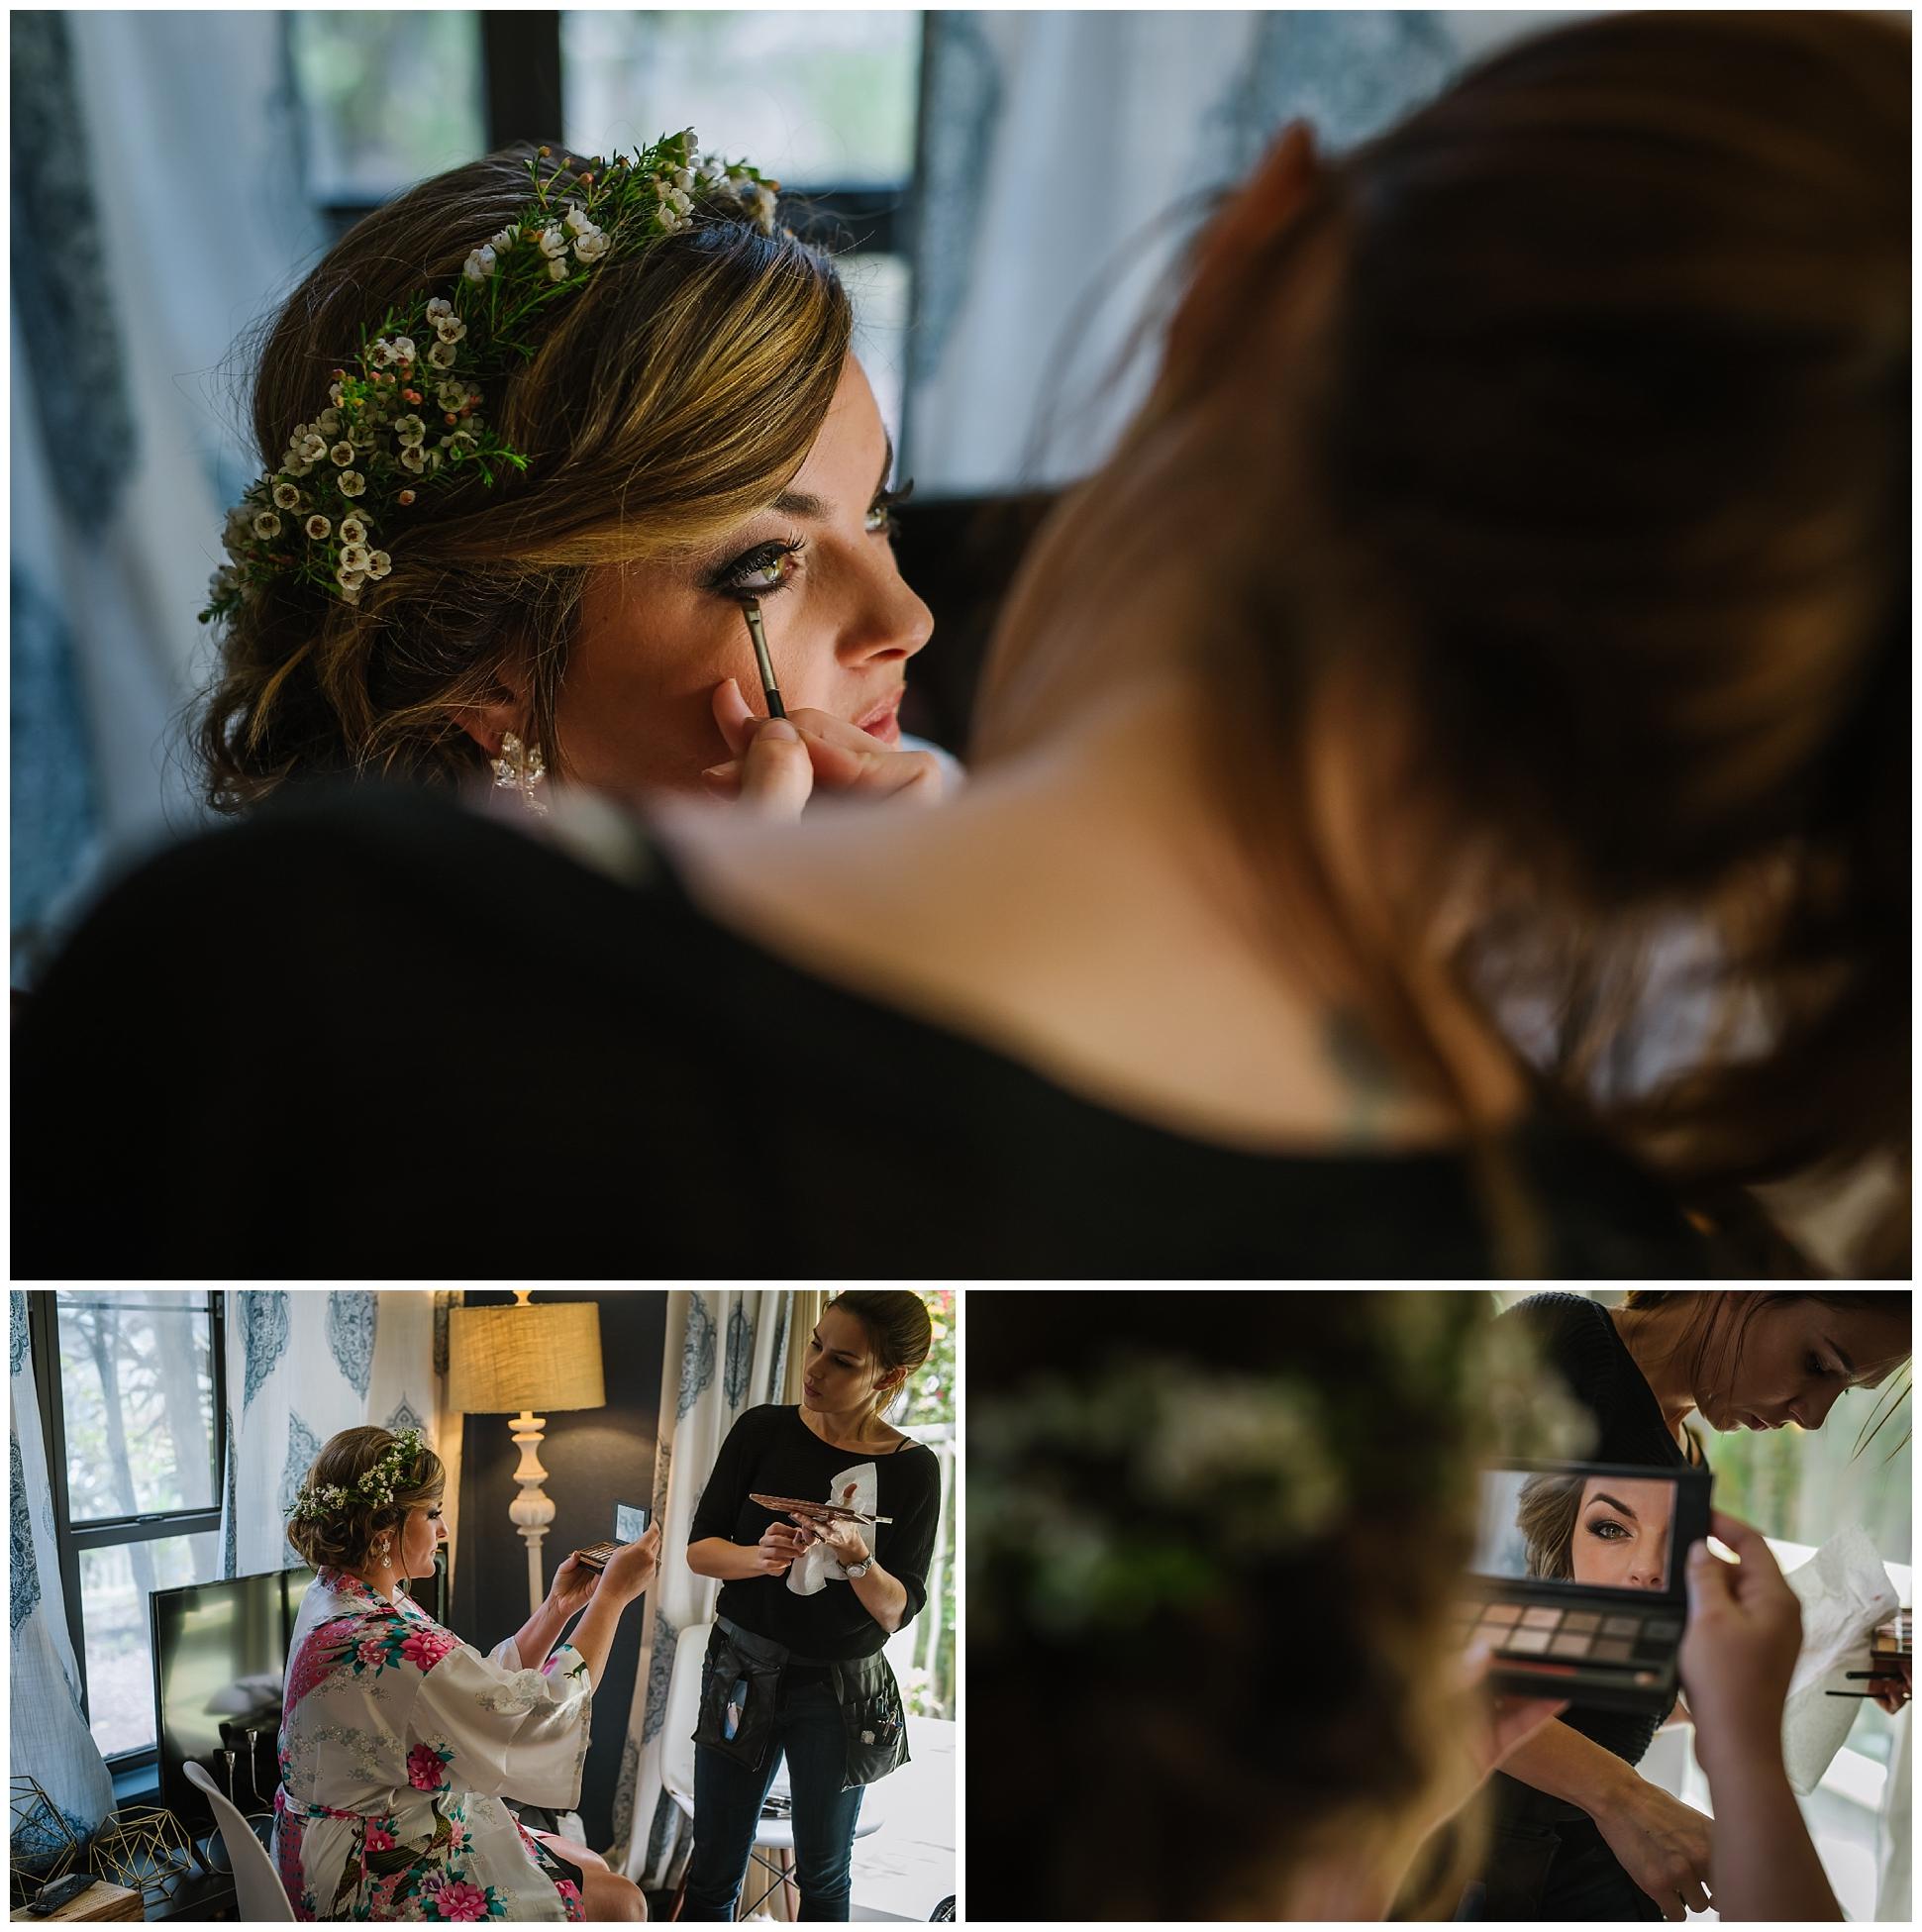 st-pete-wedding-photographer-italian-romance-theme-rustic-flower-crown_0379.jpg